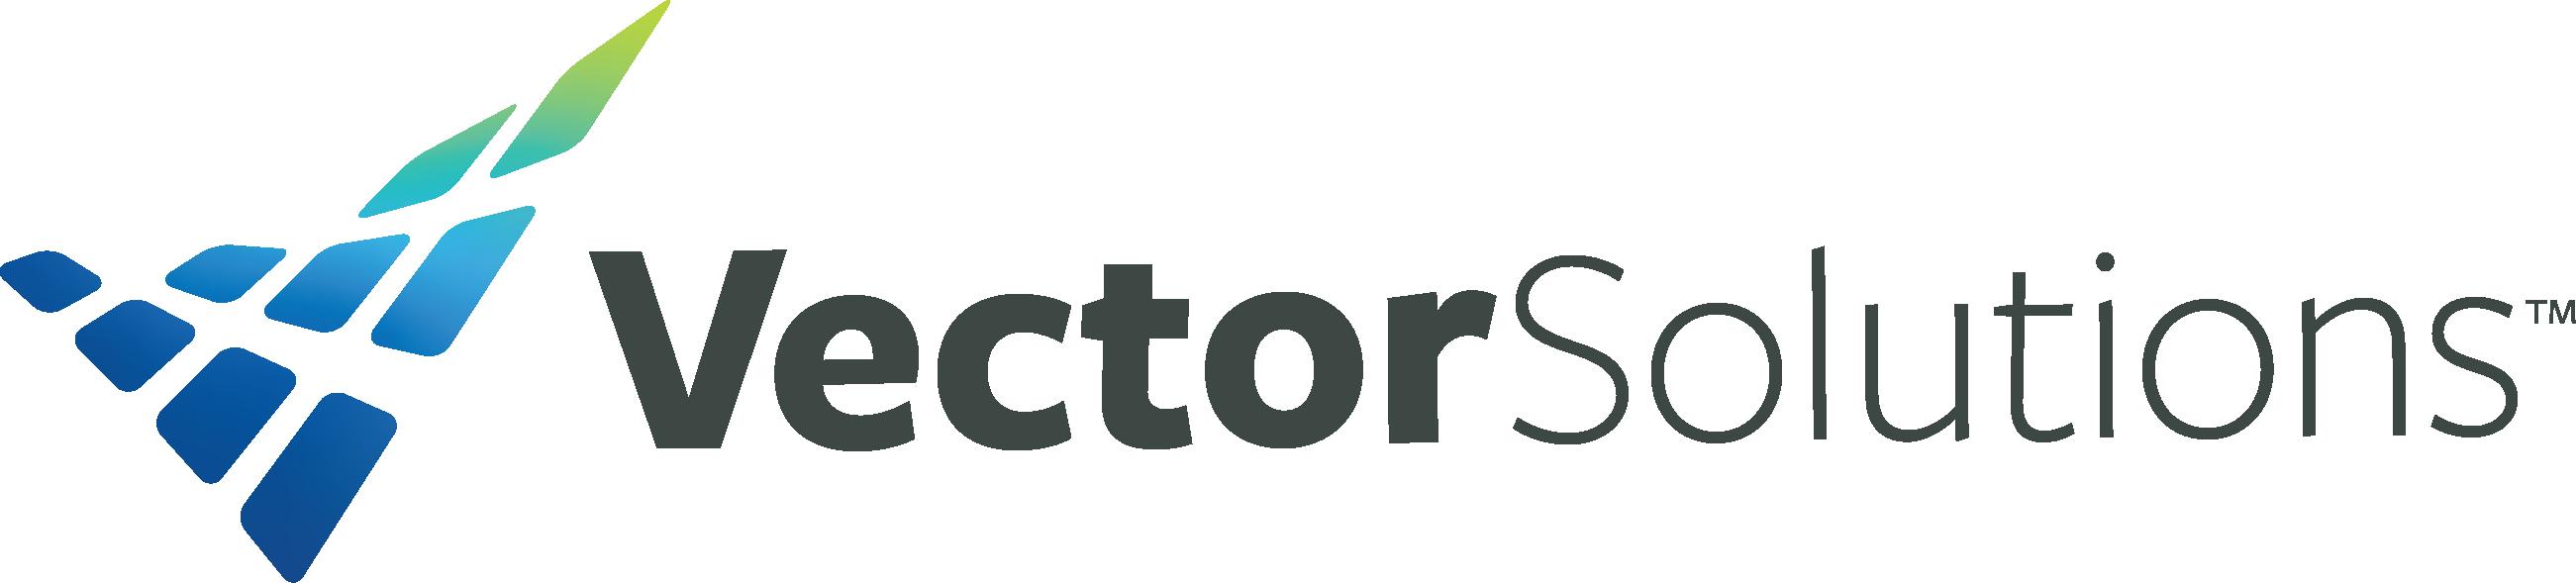 VectorSolutions